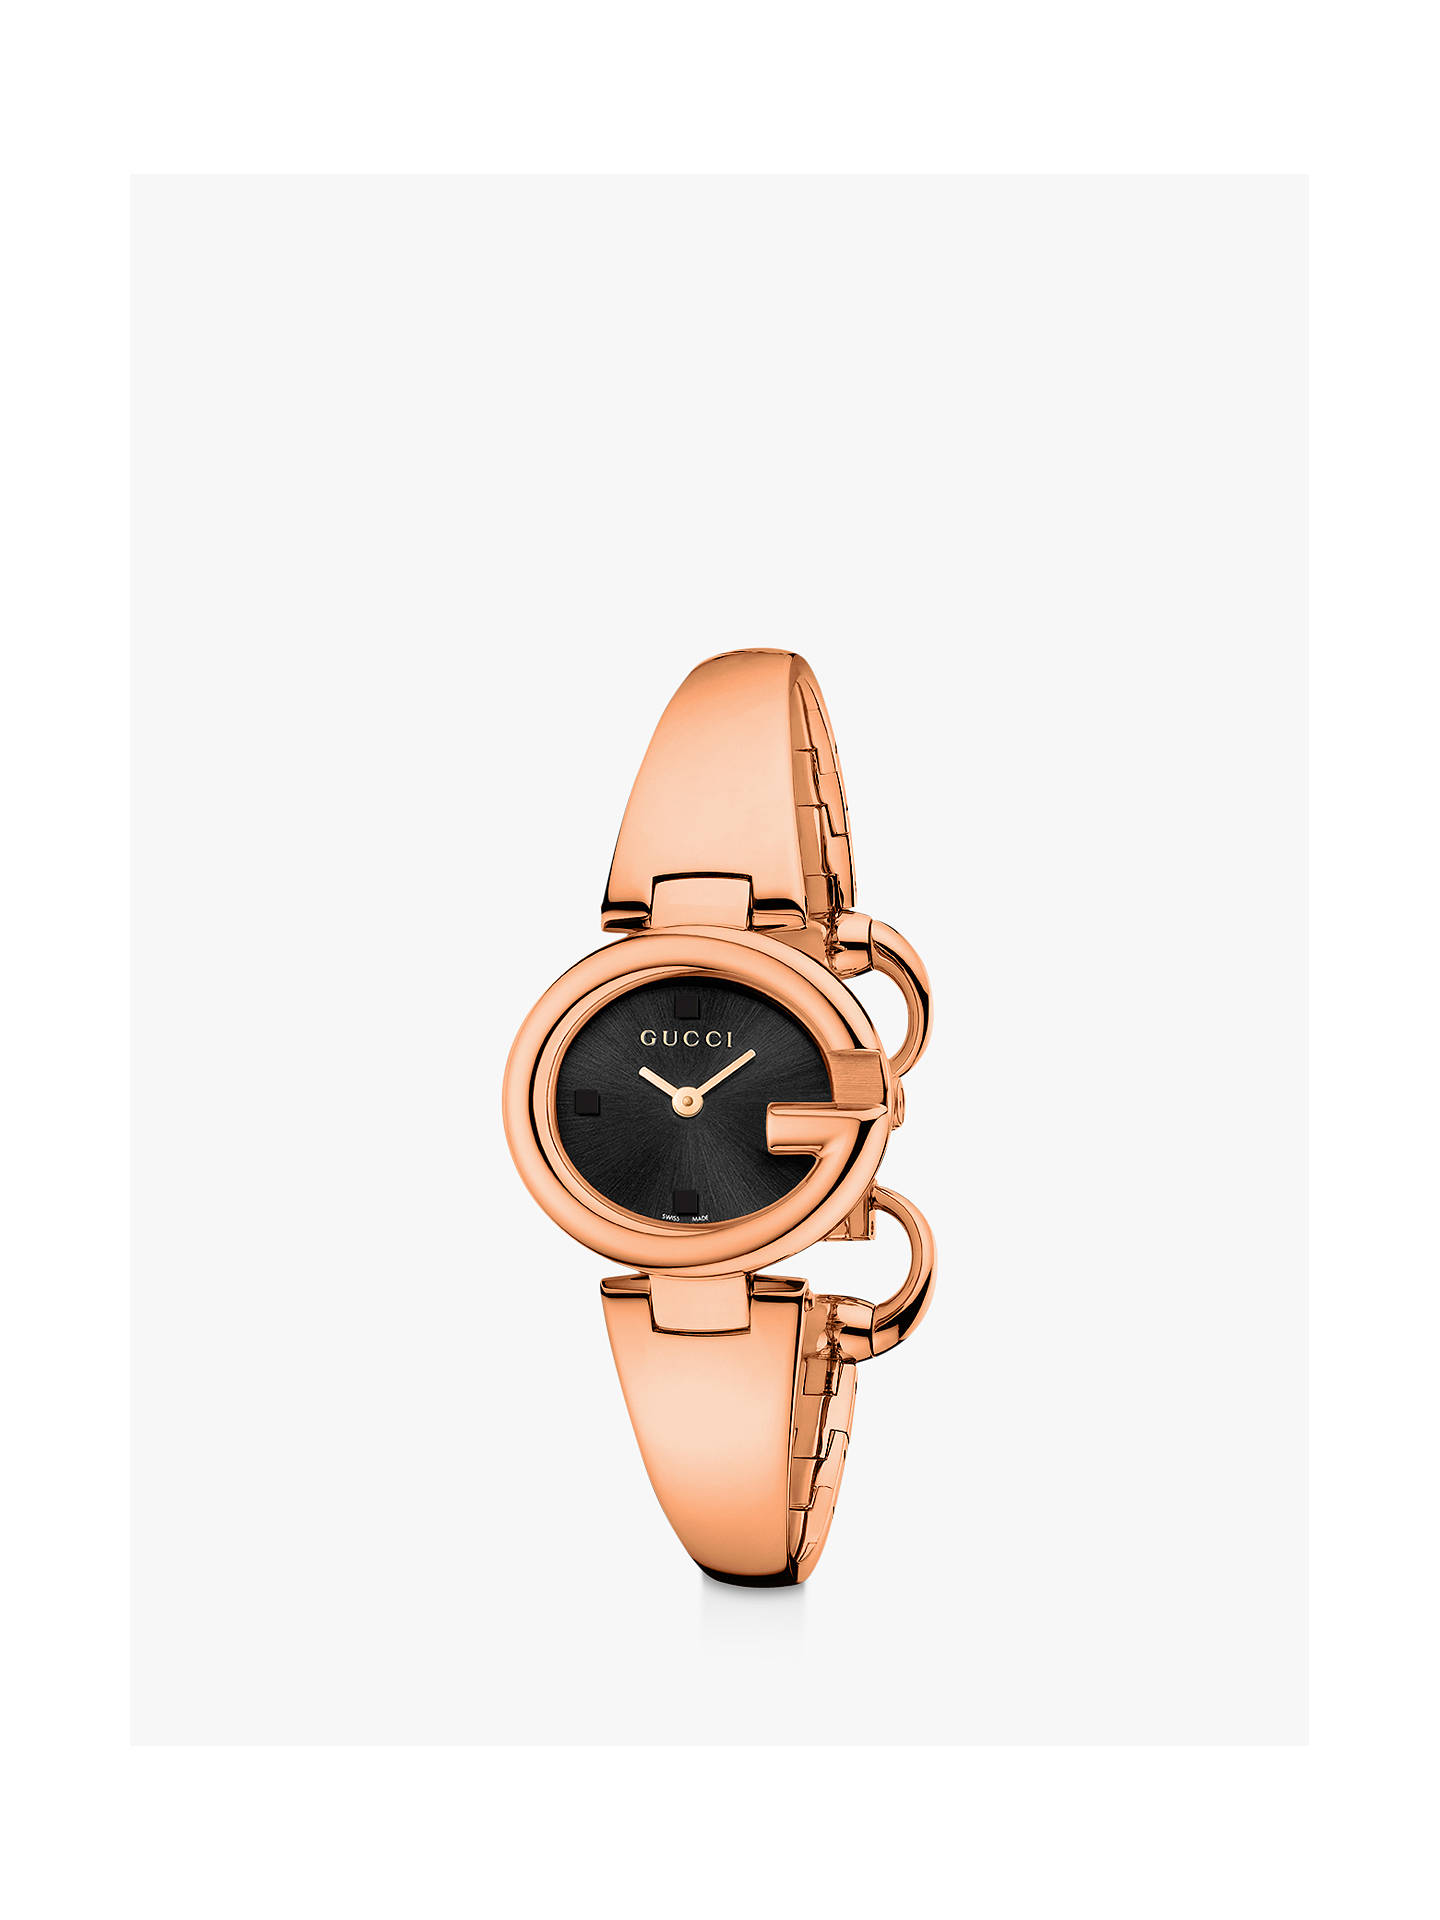 65b5405b053bb Gucci YA134509 Women's Guccissima Bangle Strap Watch, Rose Gold/Black